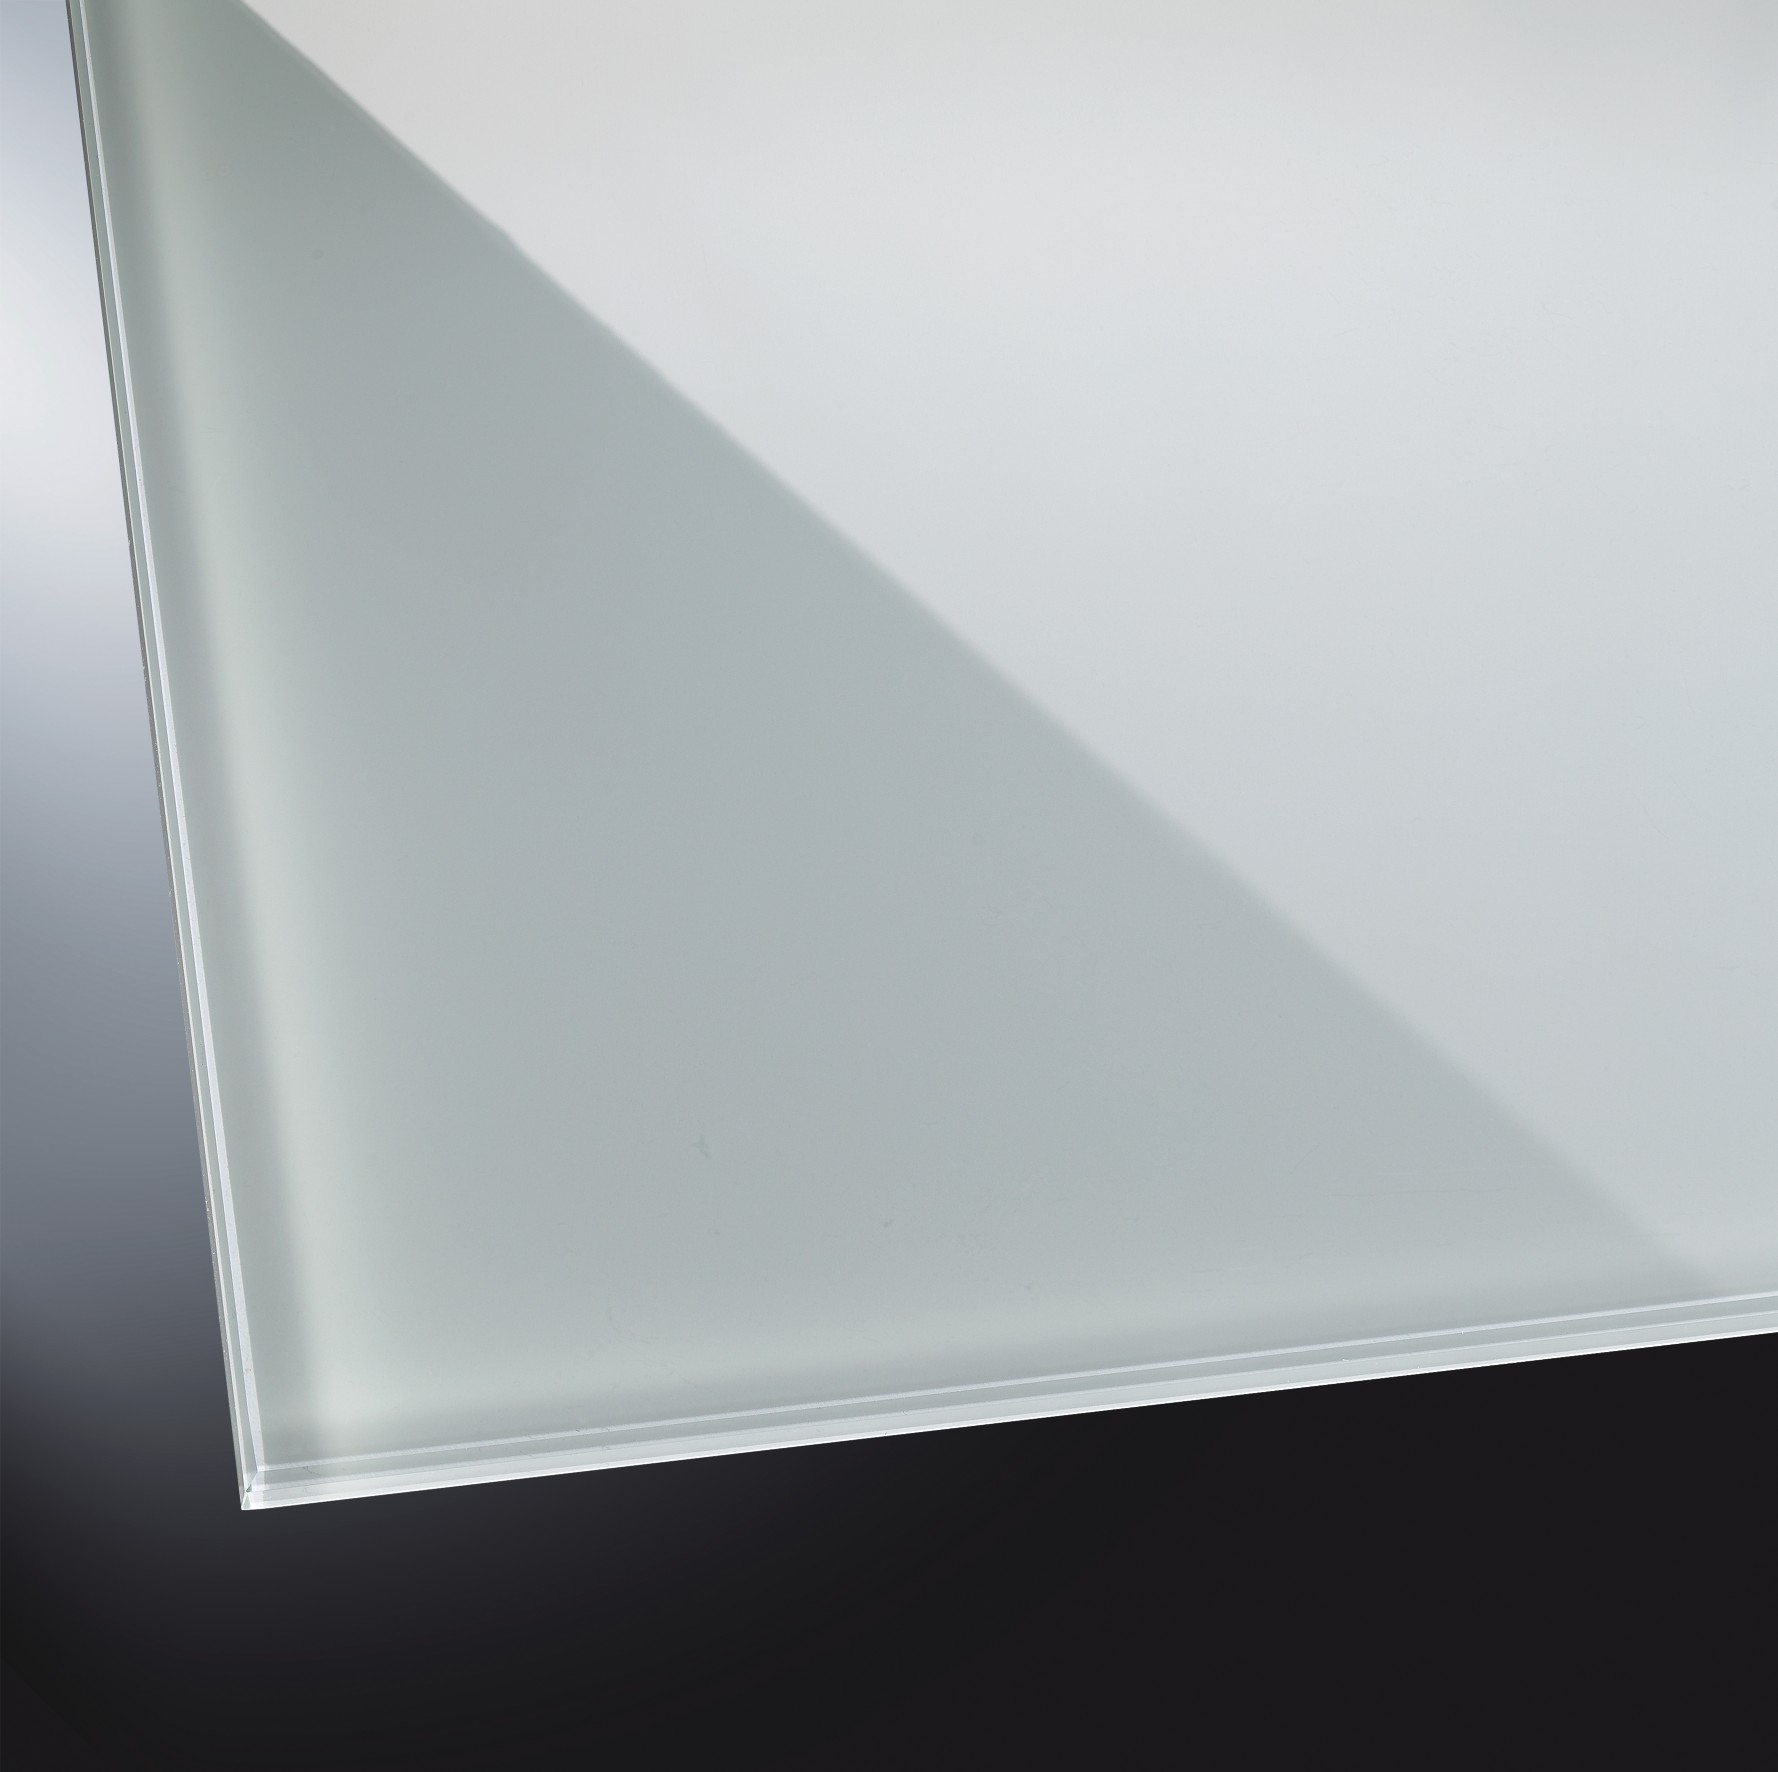 esg lackiertes glas gl nzend classic grey 7035 glasheld. Black Bedroom Furniture Sets. Home Design Ideas